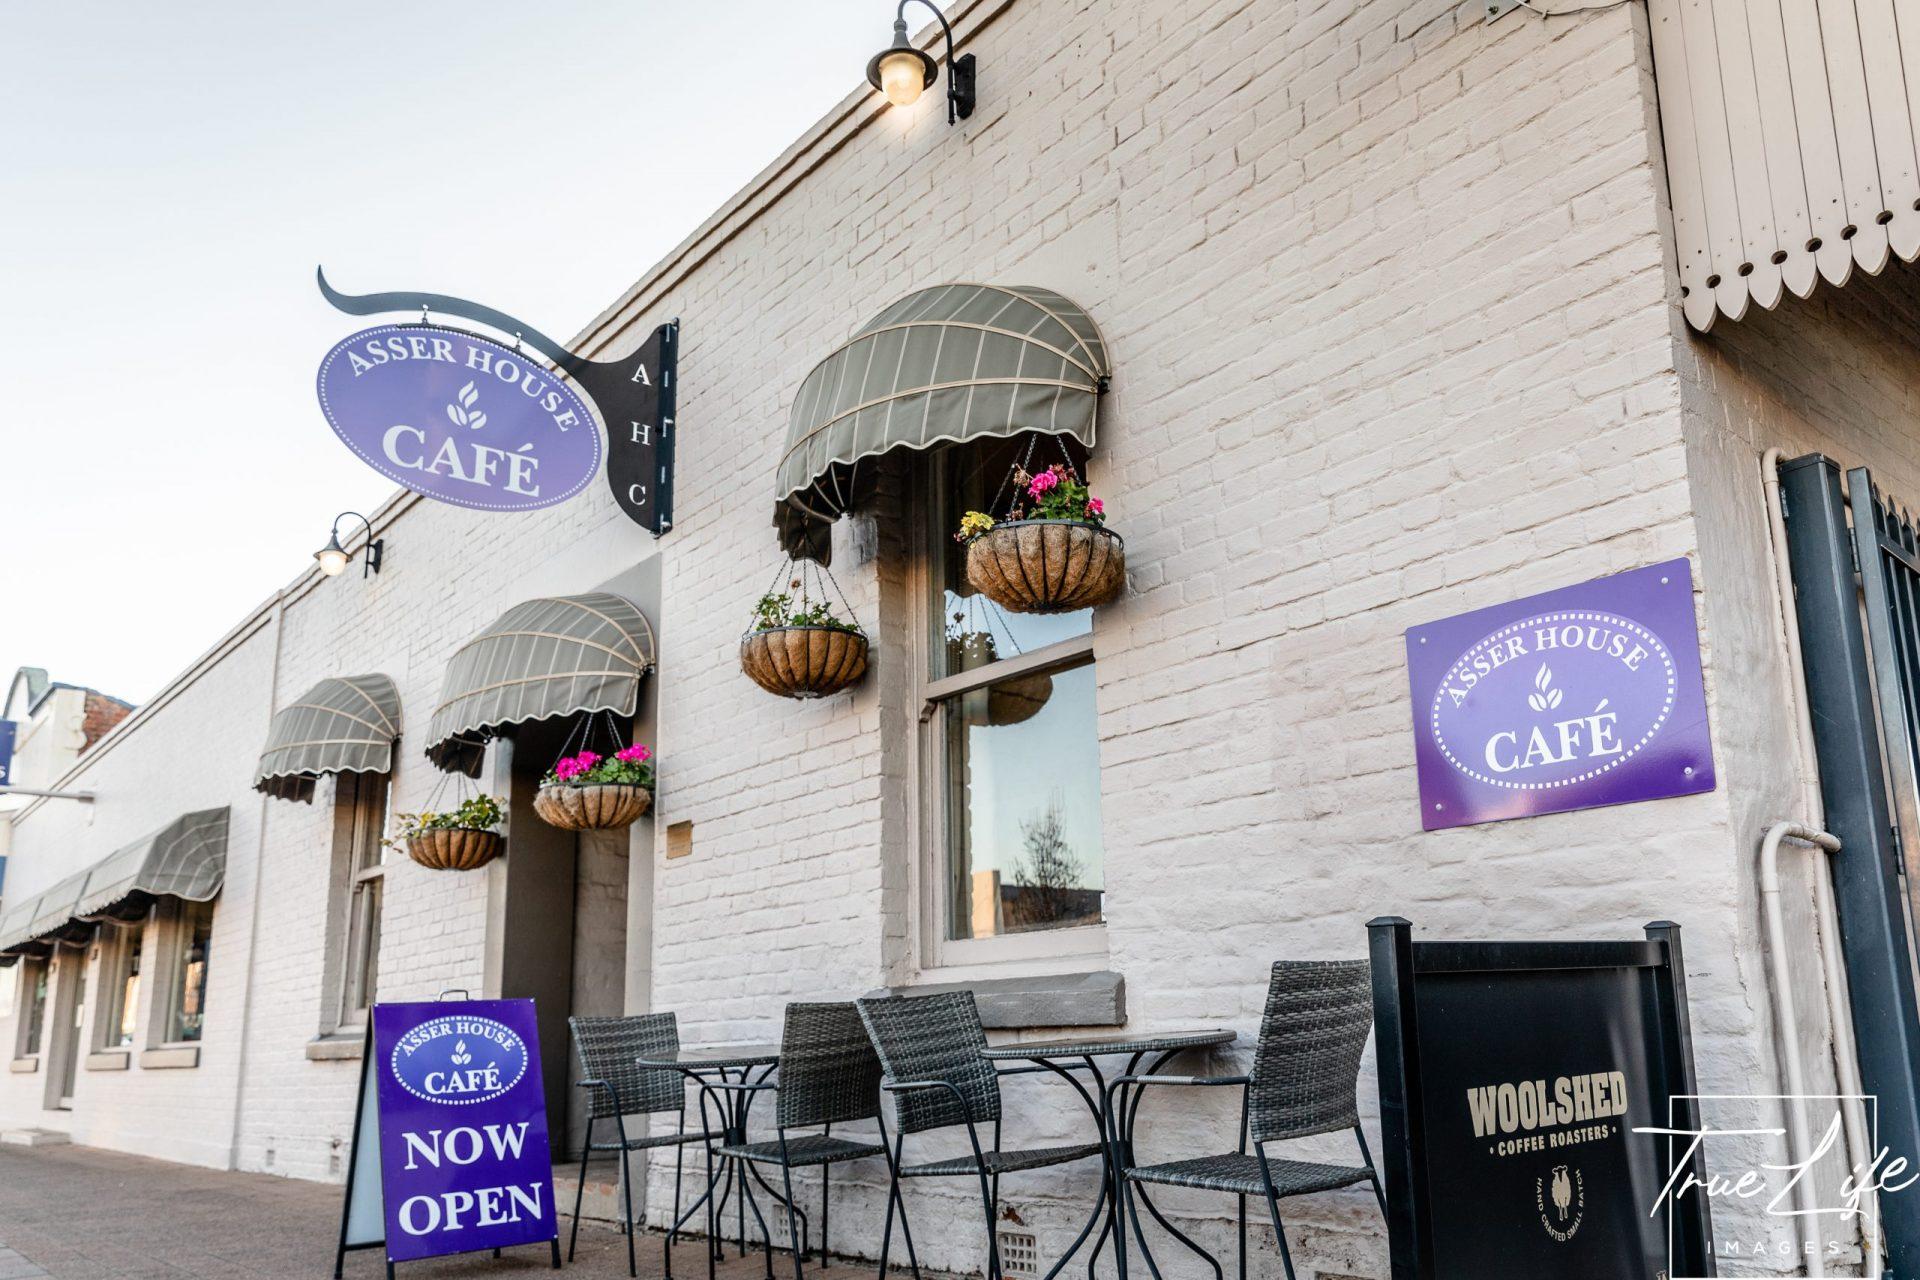 Asser House Cafe